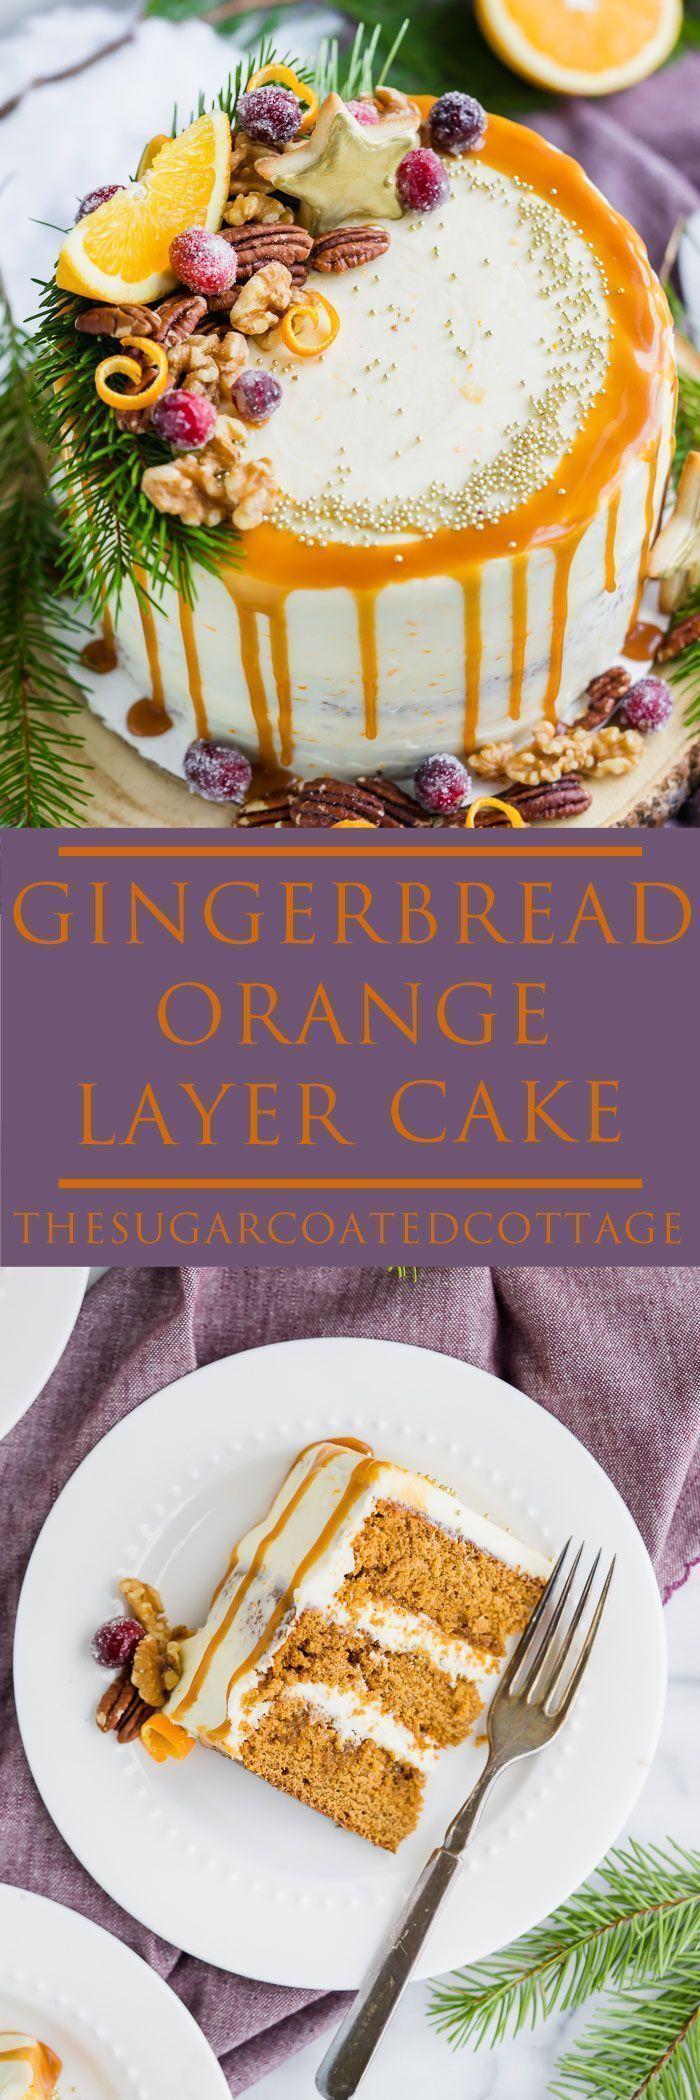 Gingerbread Orange Layer Cake